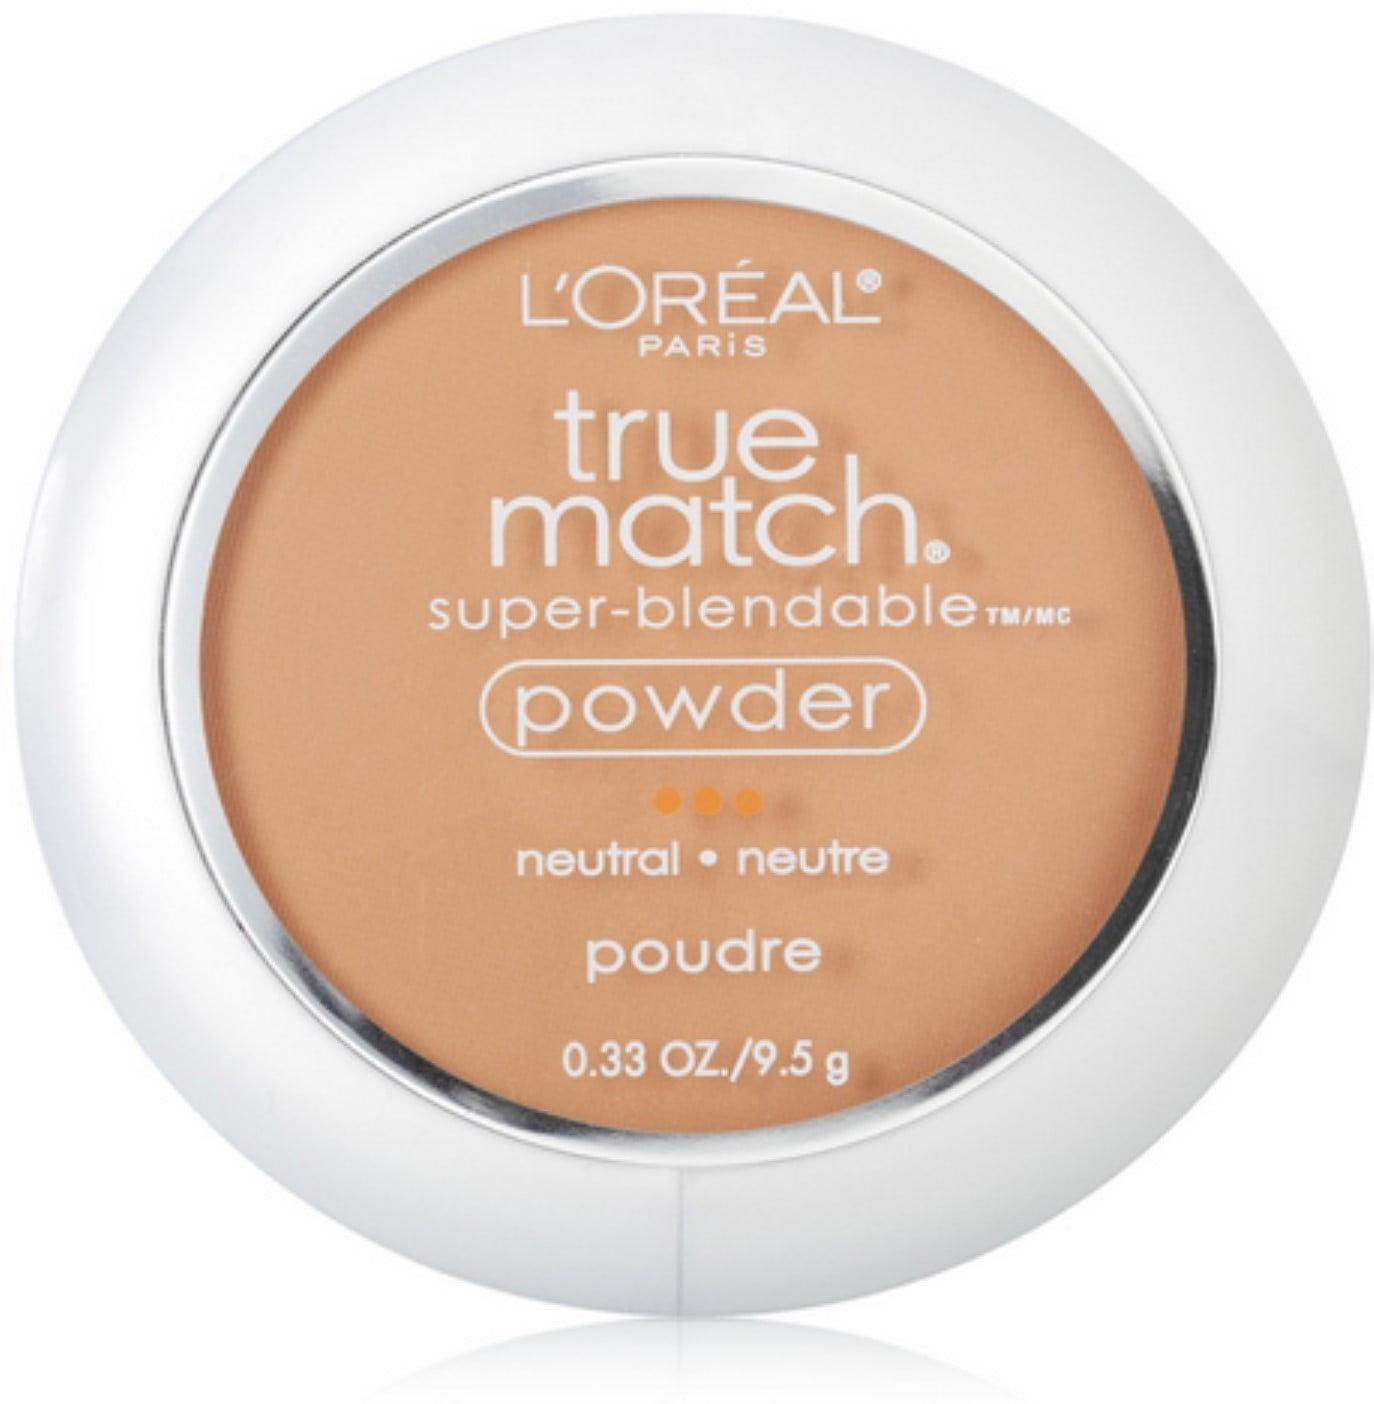 L'Oreal  True Match Super-Blendable Powder, Honey Beige [N6], 0.33 oz (Pack of 4)